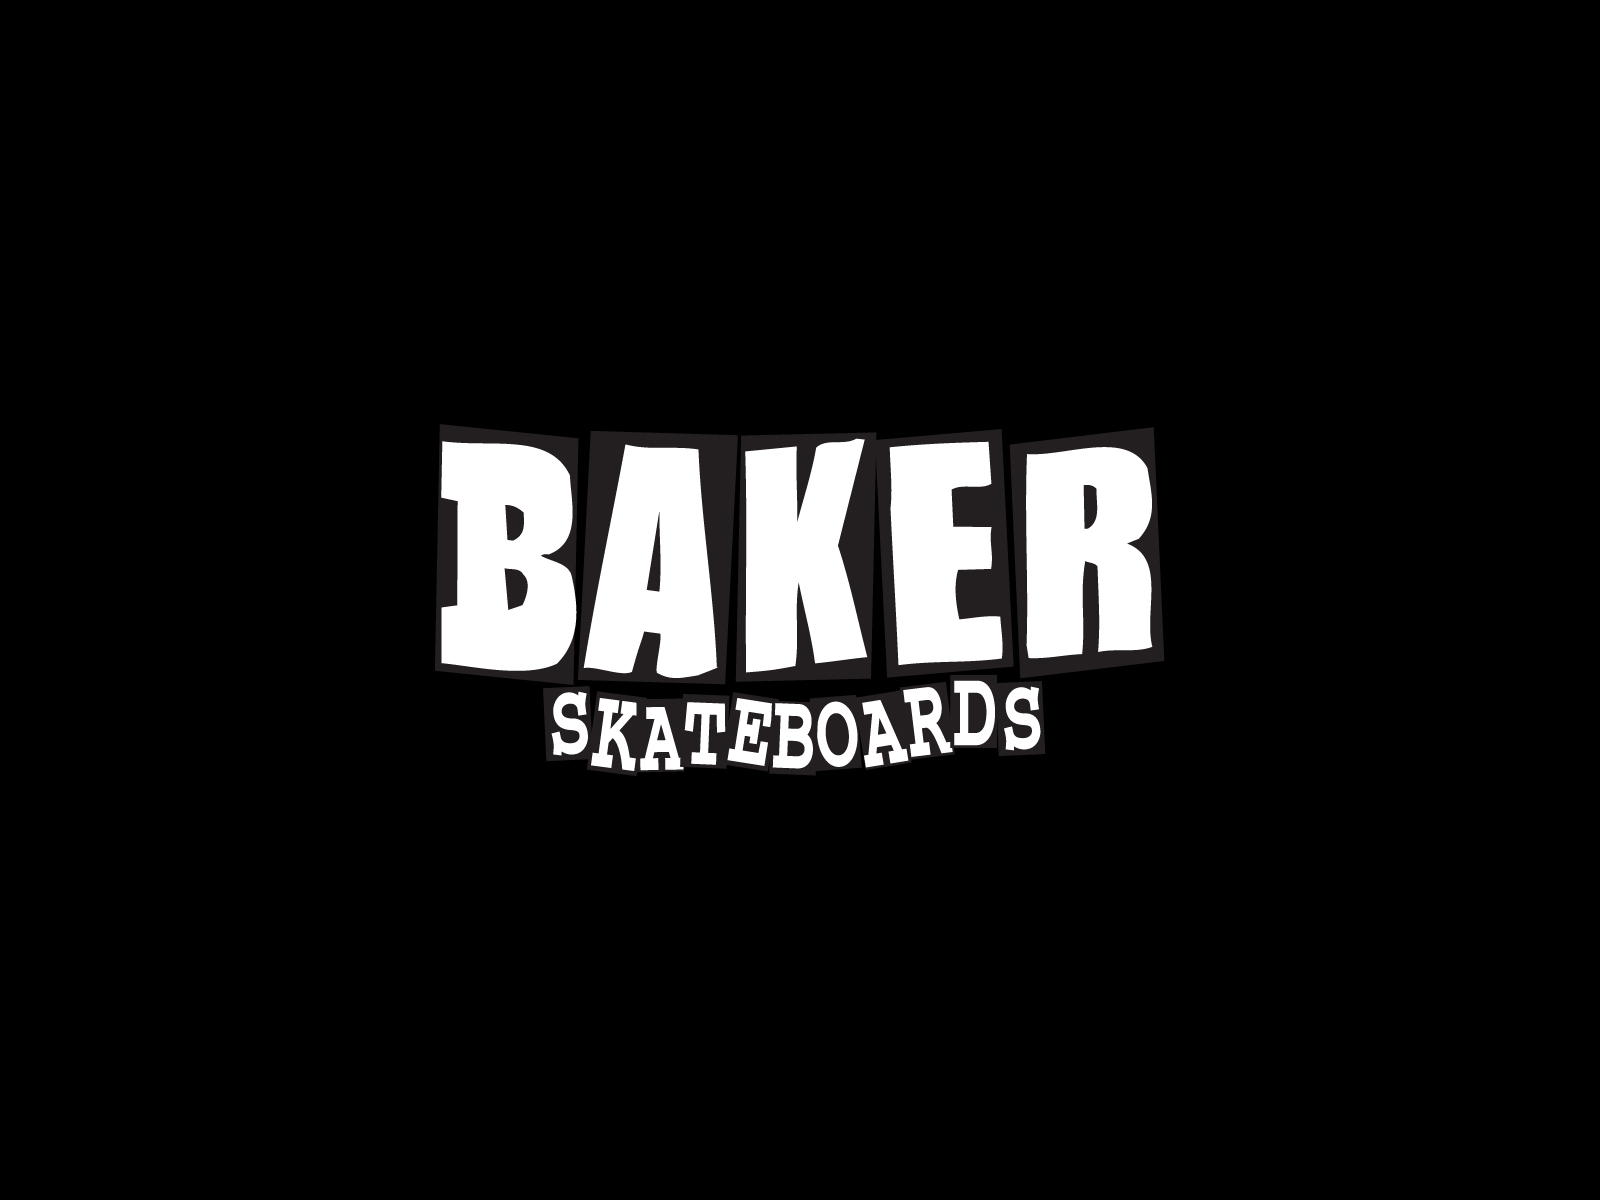 Girl Skateboard Logo Wallpaper - WallpaperSafari